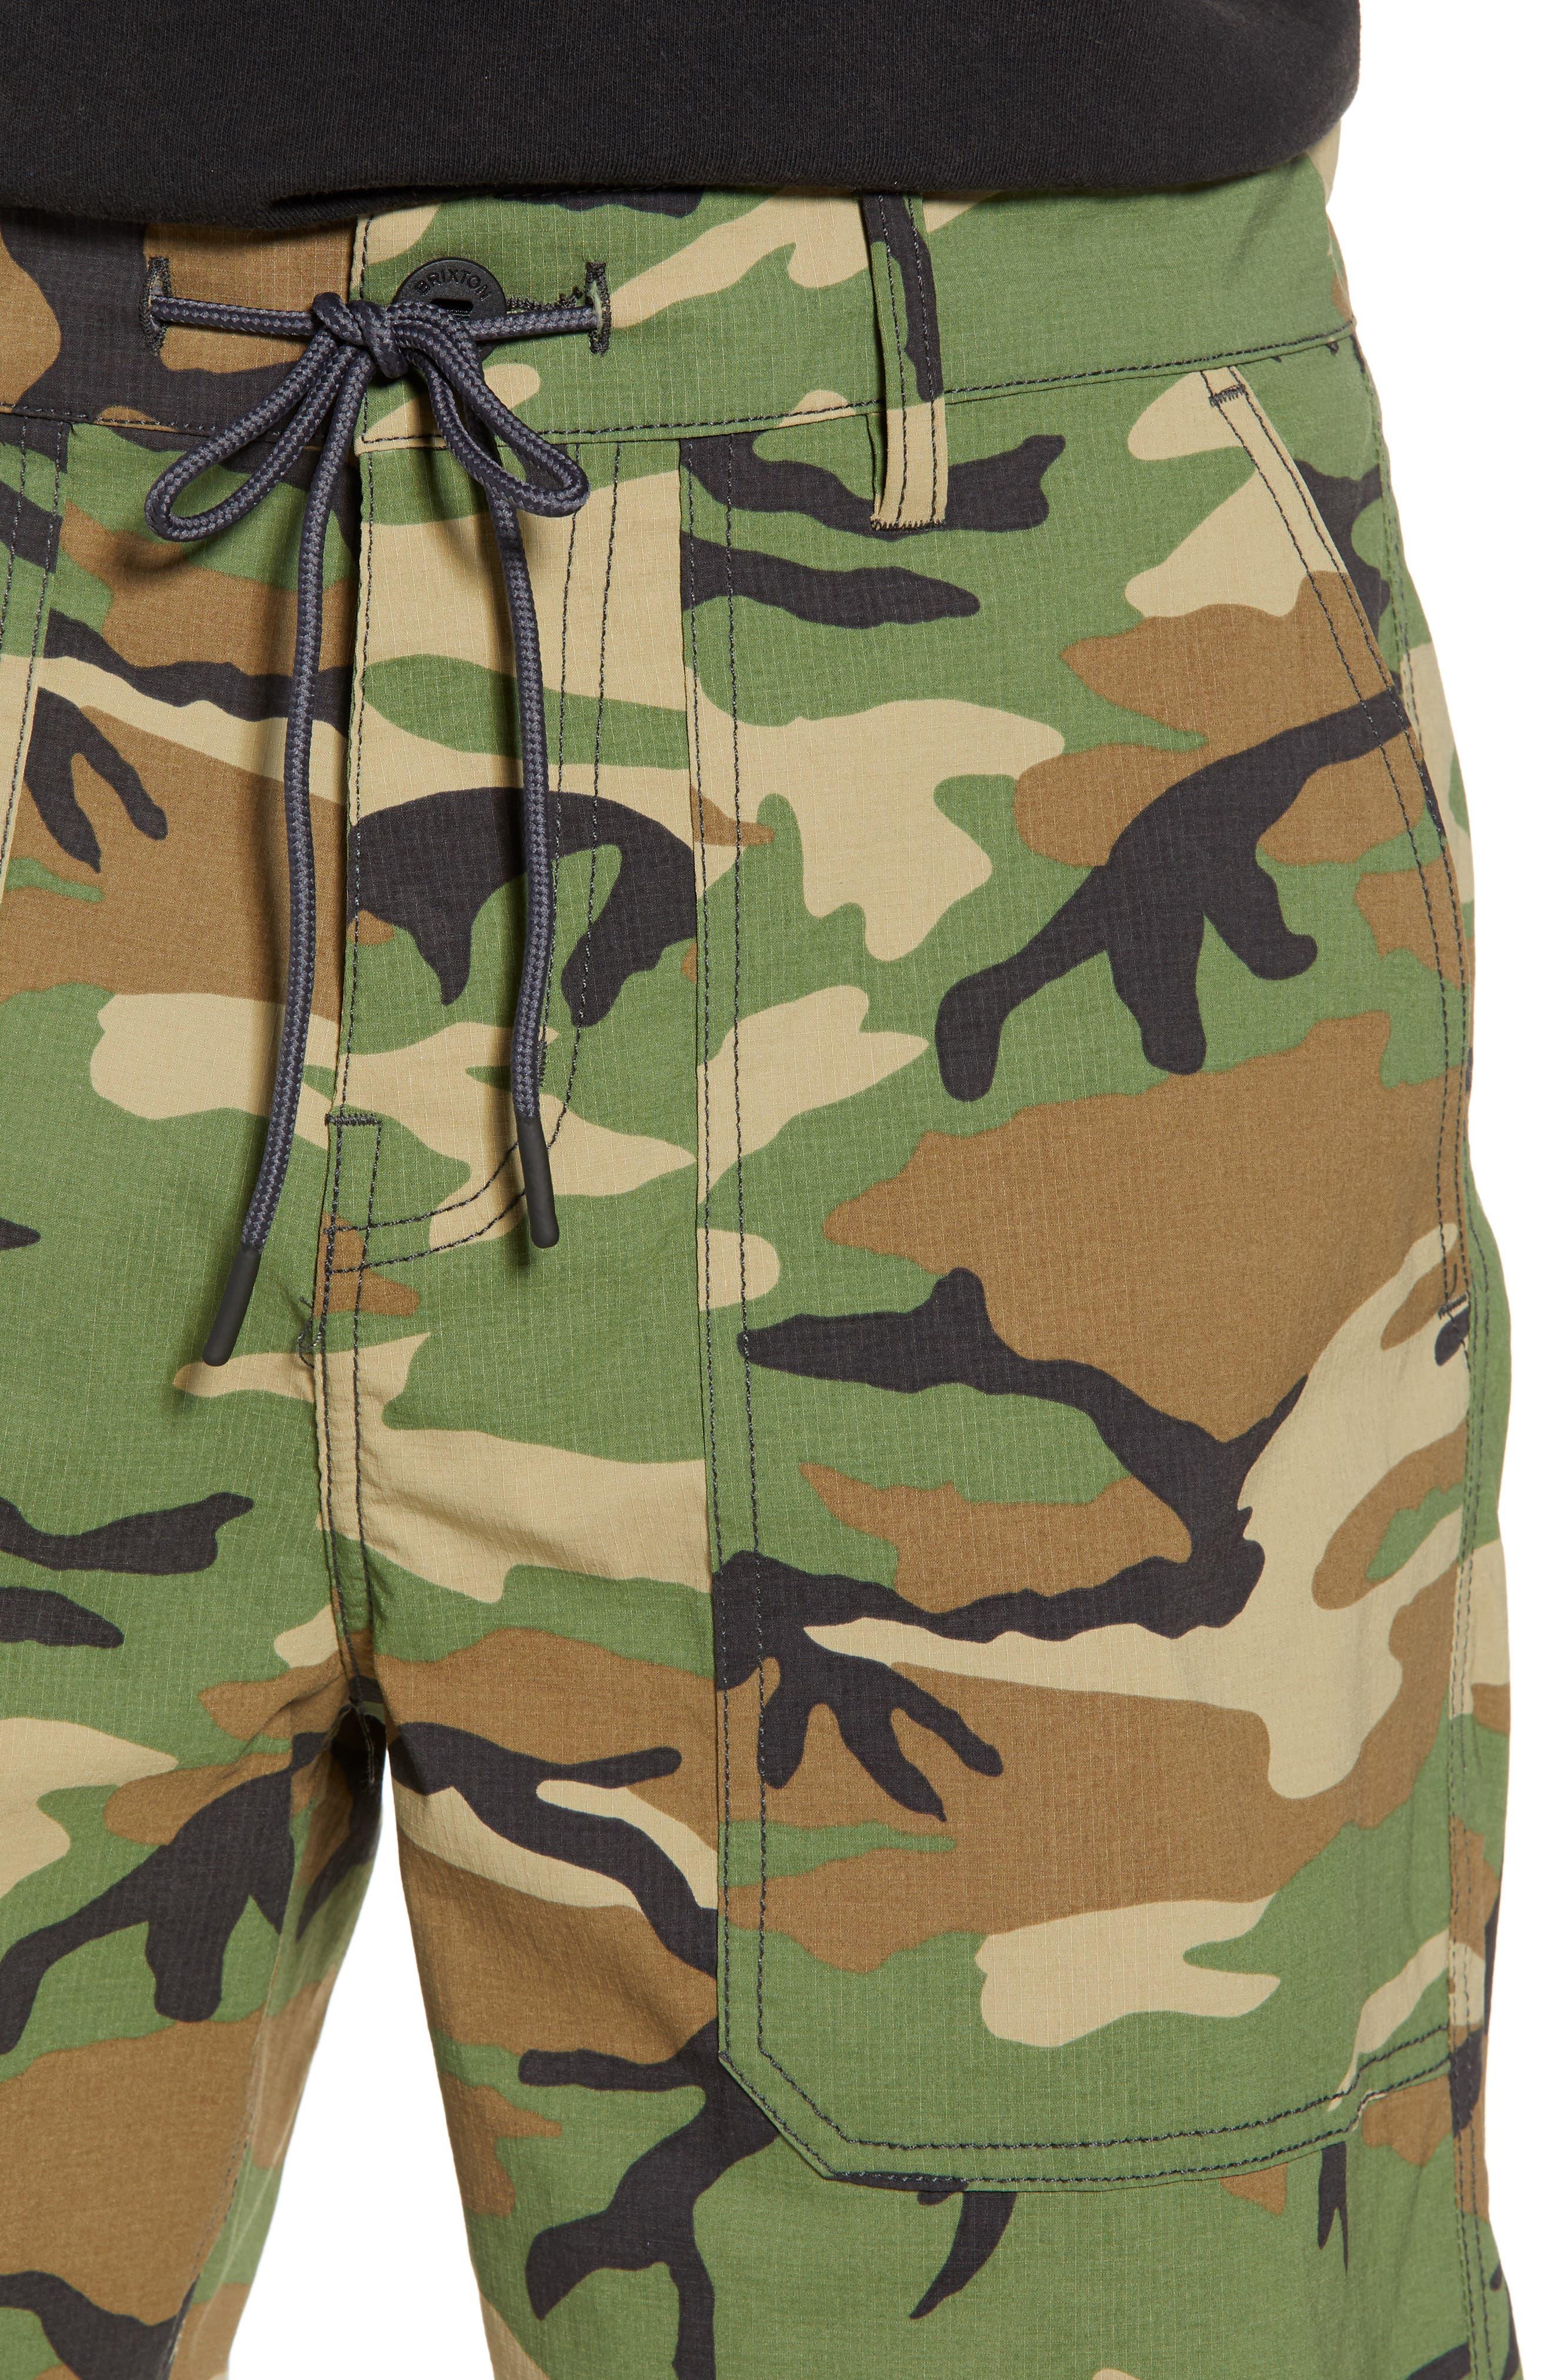 Prospect Service Shorts,                             Alternate thumbnail 4, color,                             Multi Camo